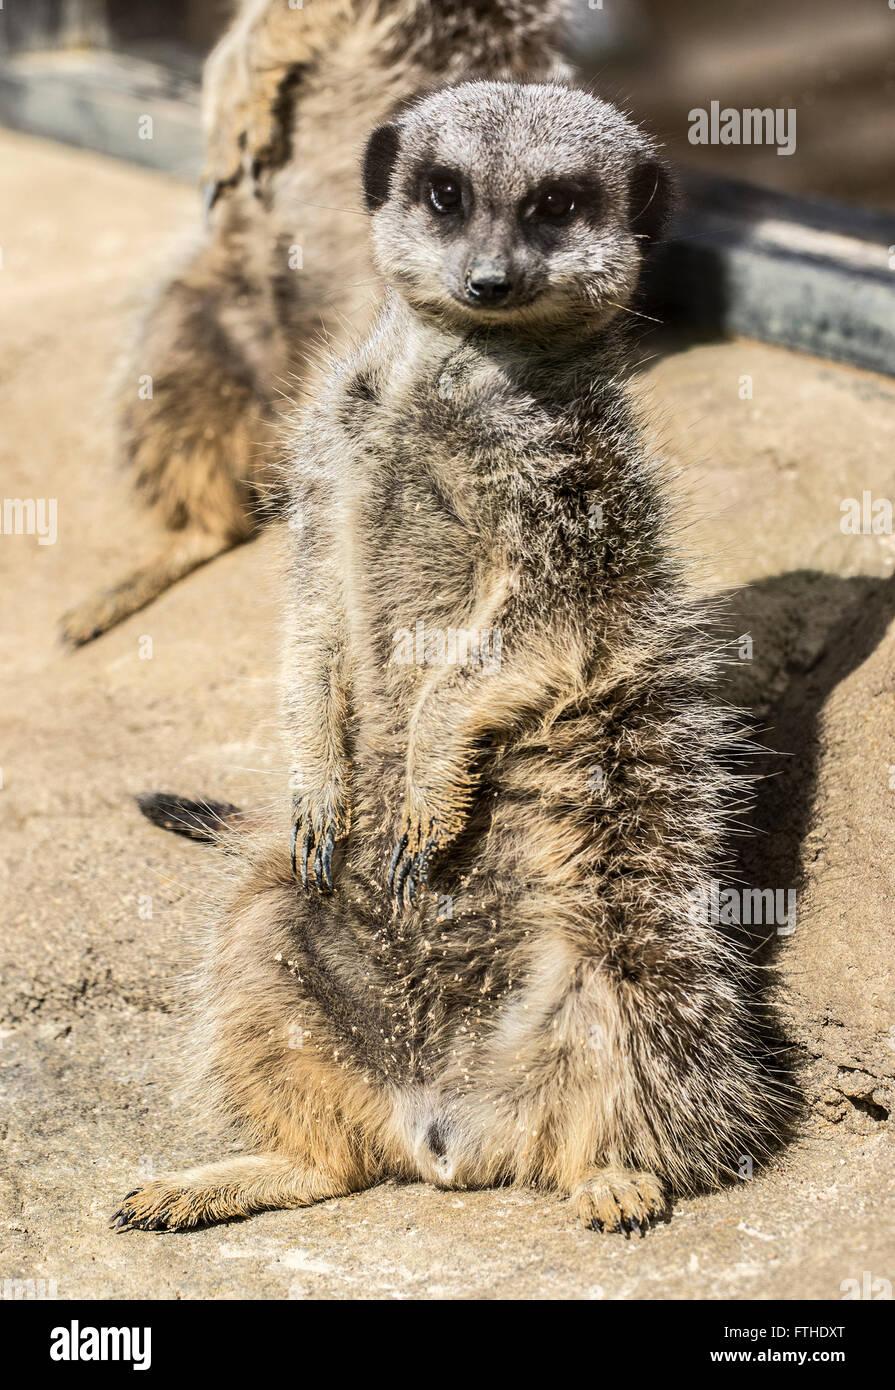 Meerkat sitting in the sun - Stock Image